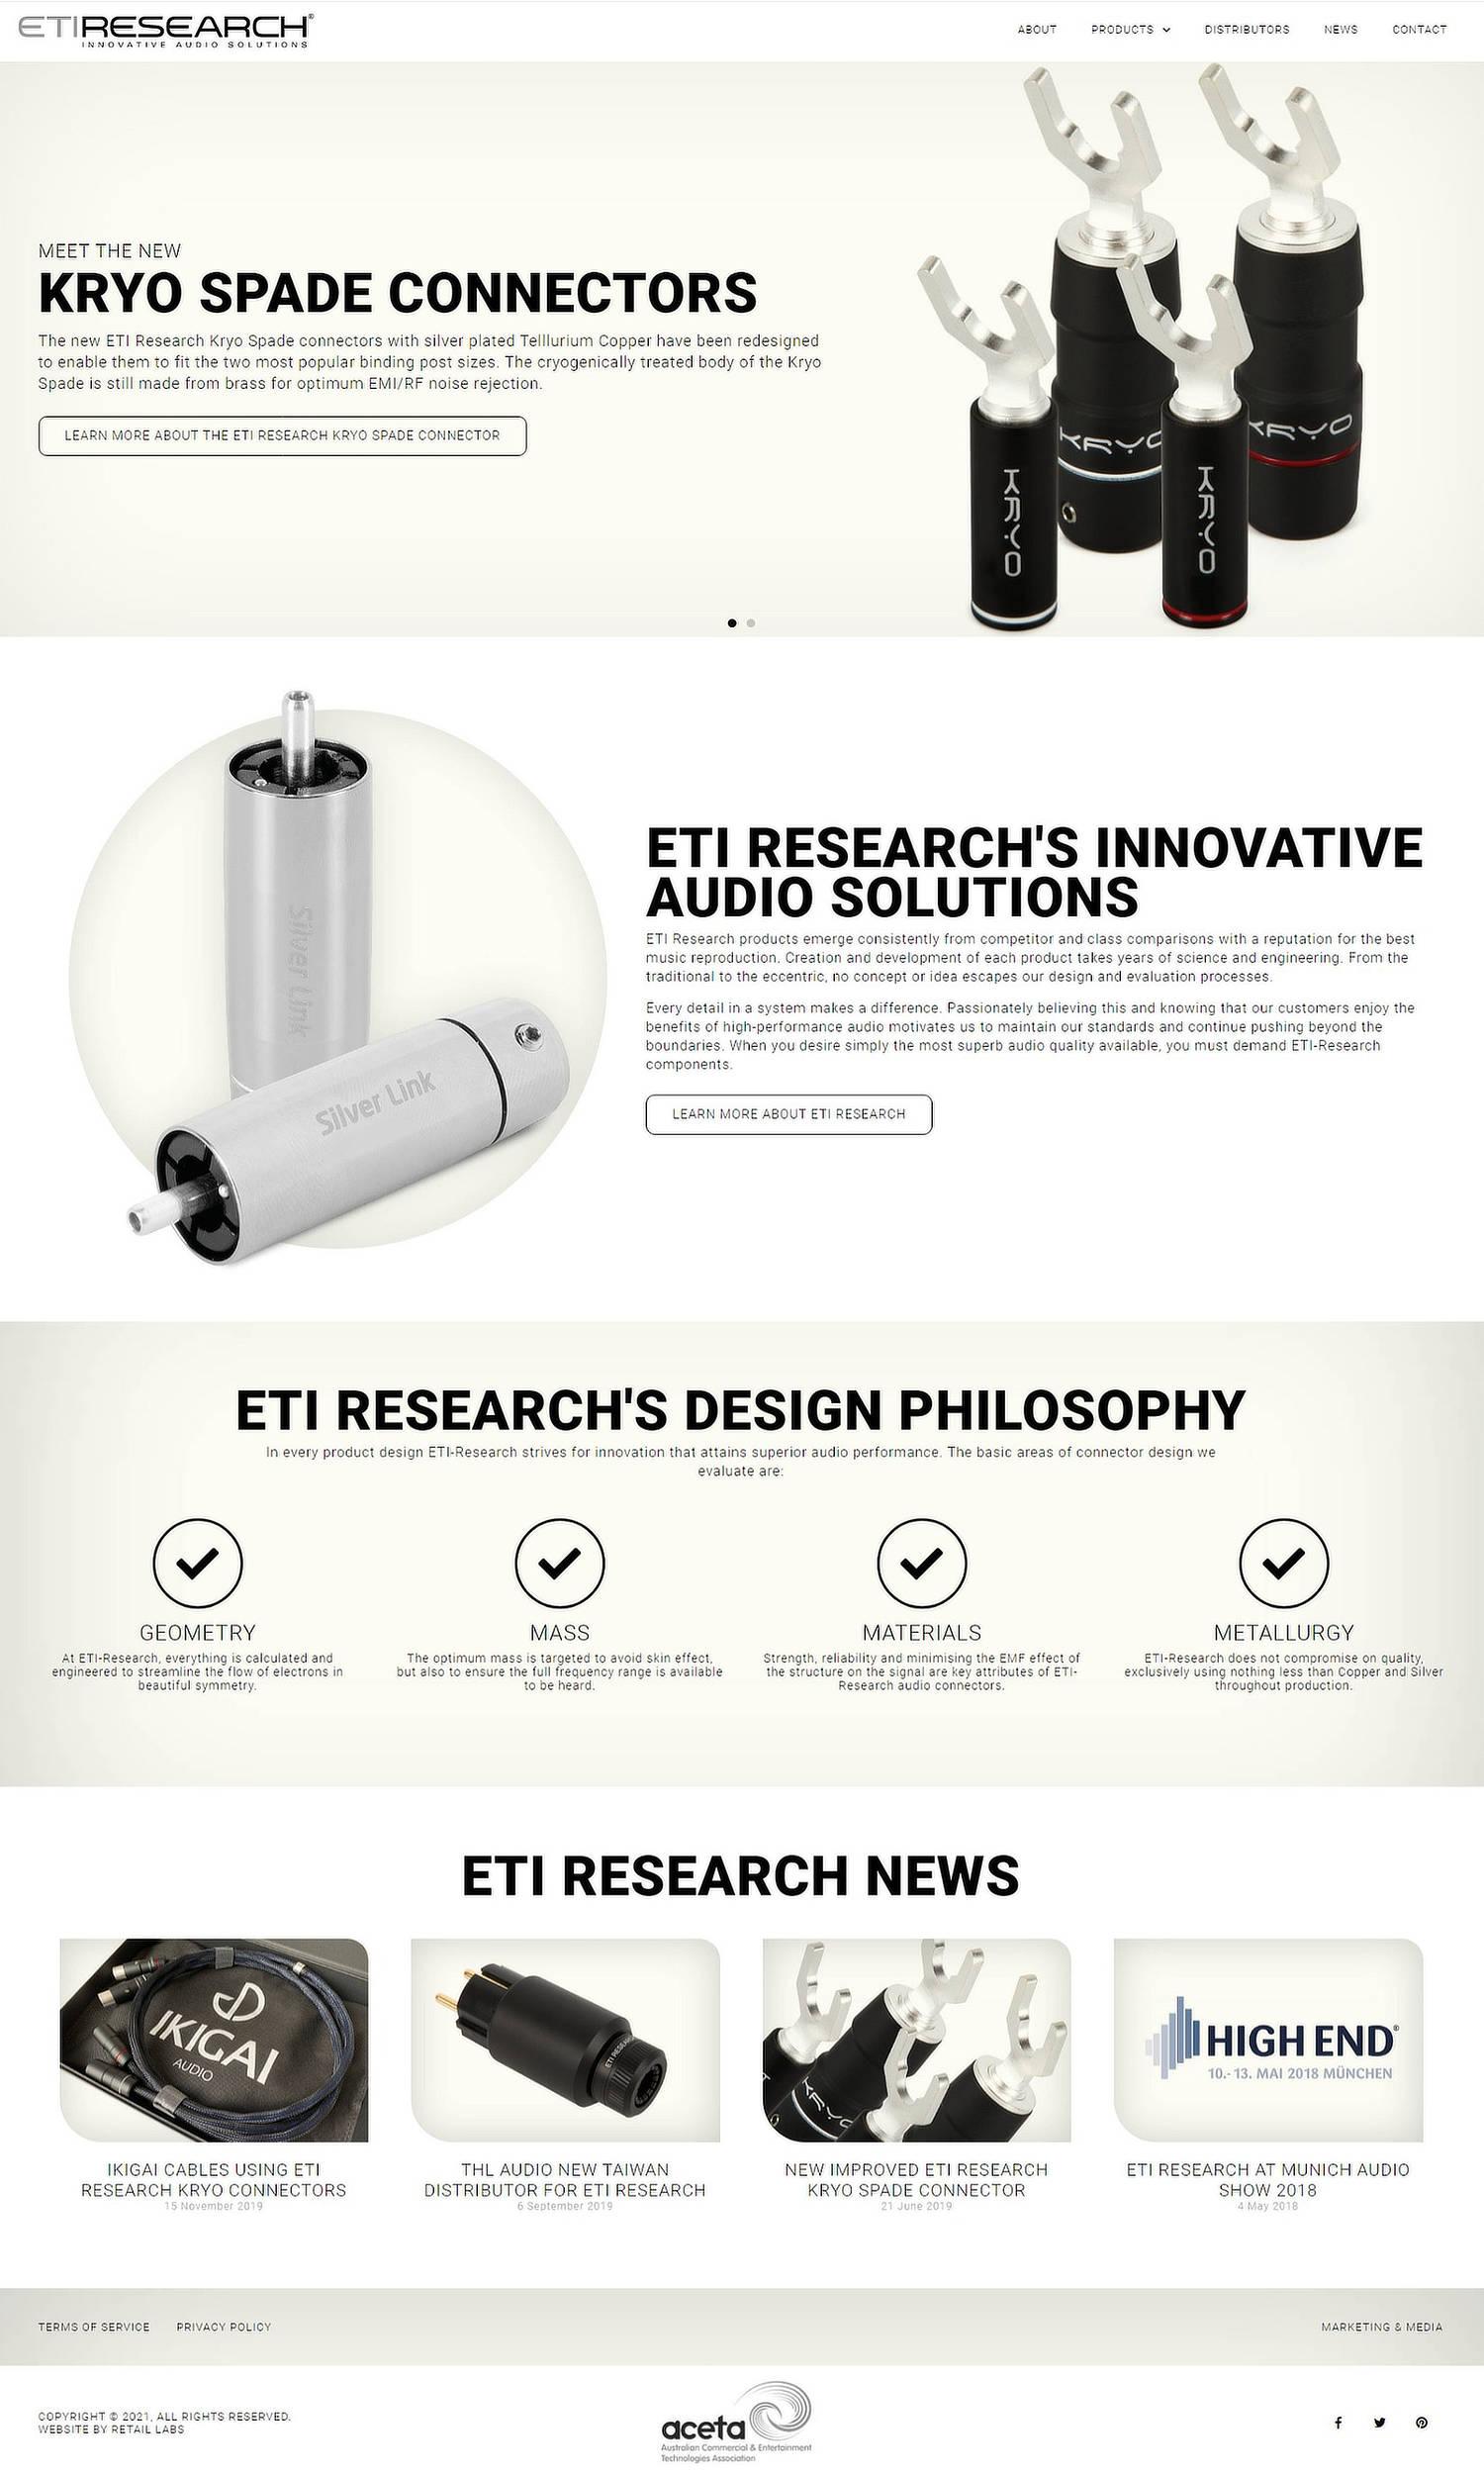 ETI Research 3